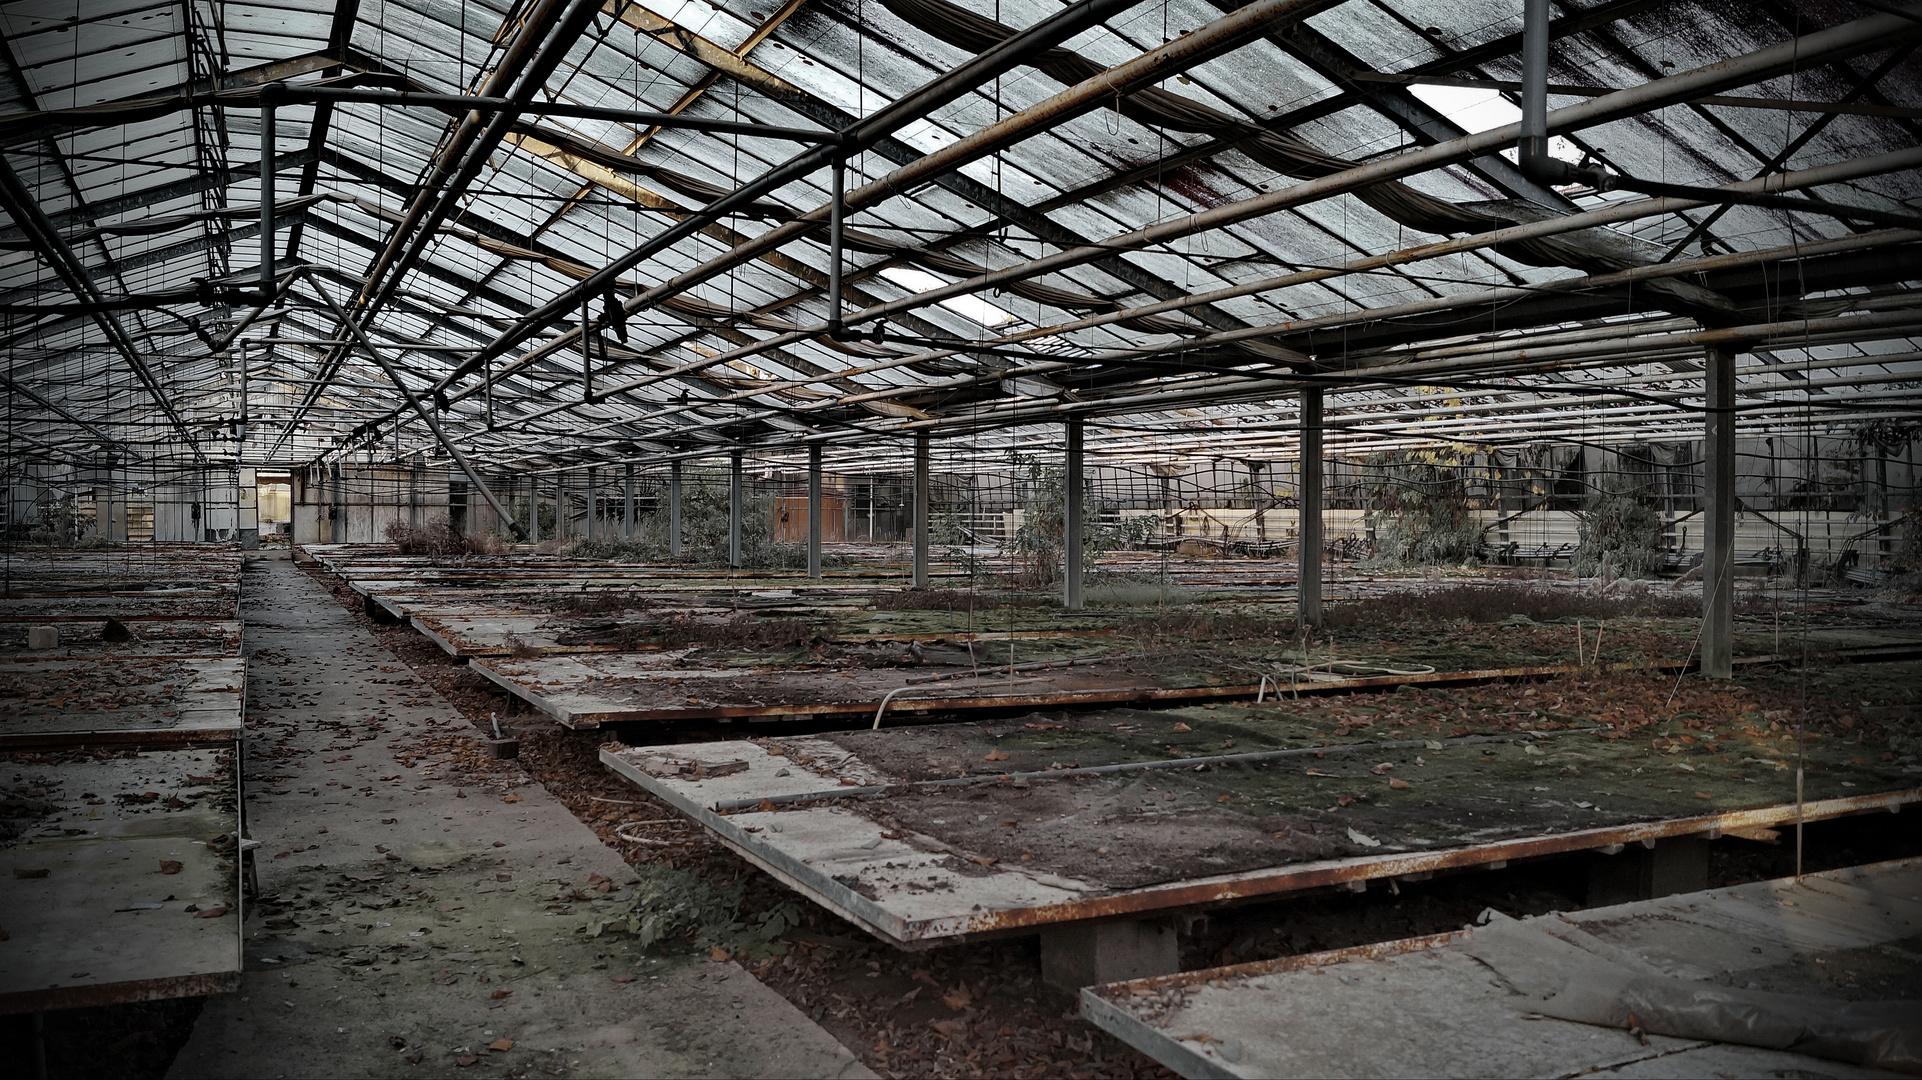 Neubepflanzung - Garzweiler II